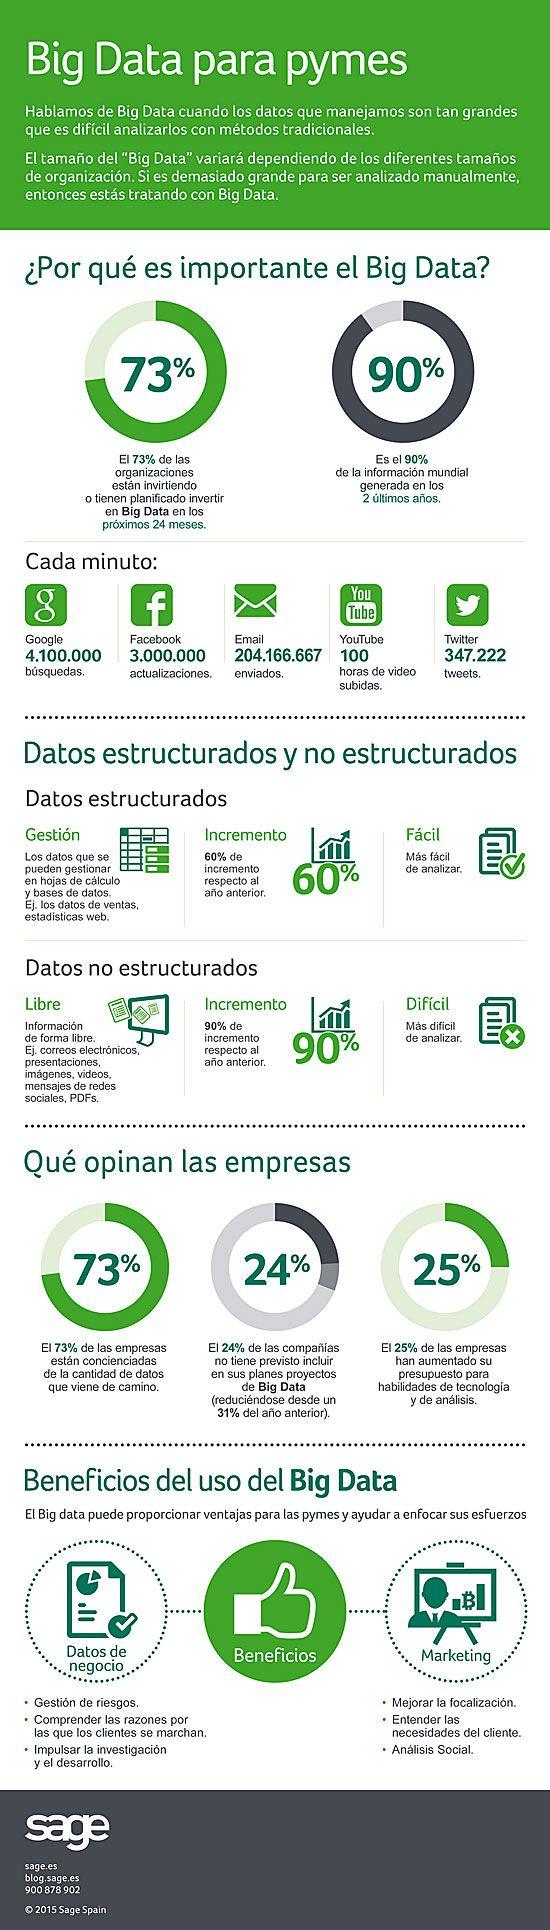 #Infografia_#BigData #pymes